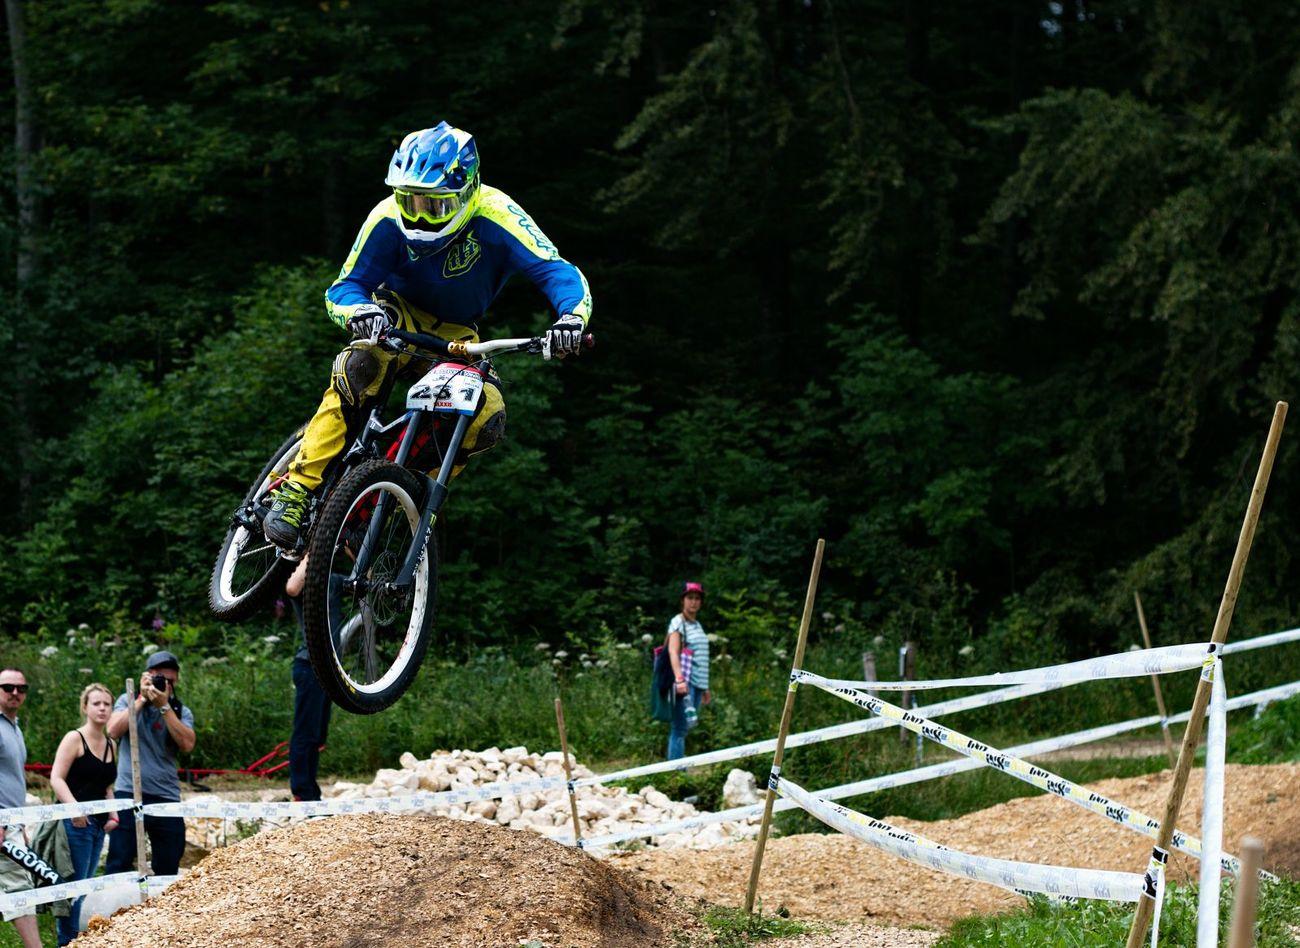 Downhill Deutsche Meisterschaft Bikepark Albstadt mehr Fotos http://dza-fotos.blogspot.de/2014/07/downhill-dm-2014.html